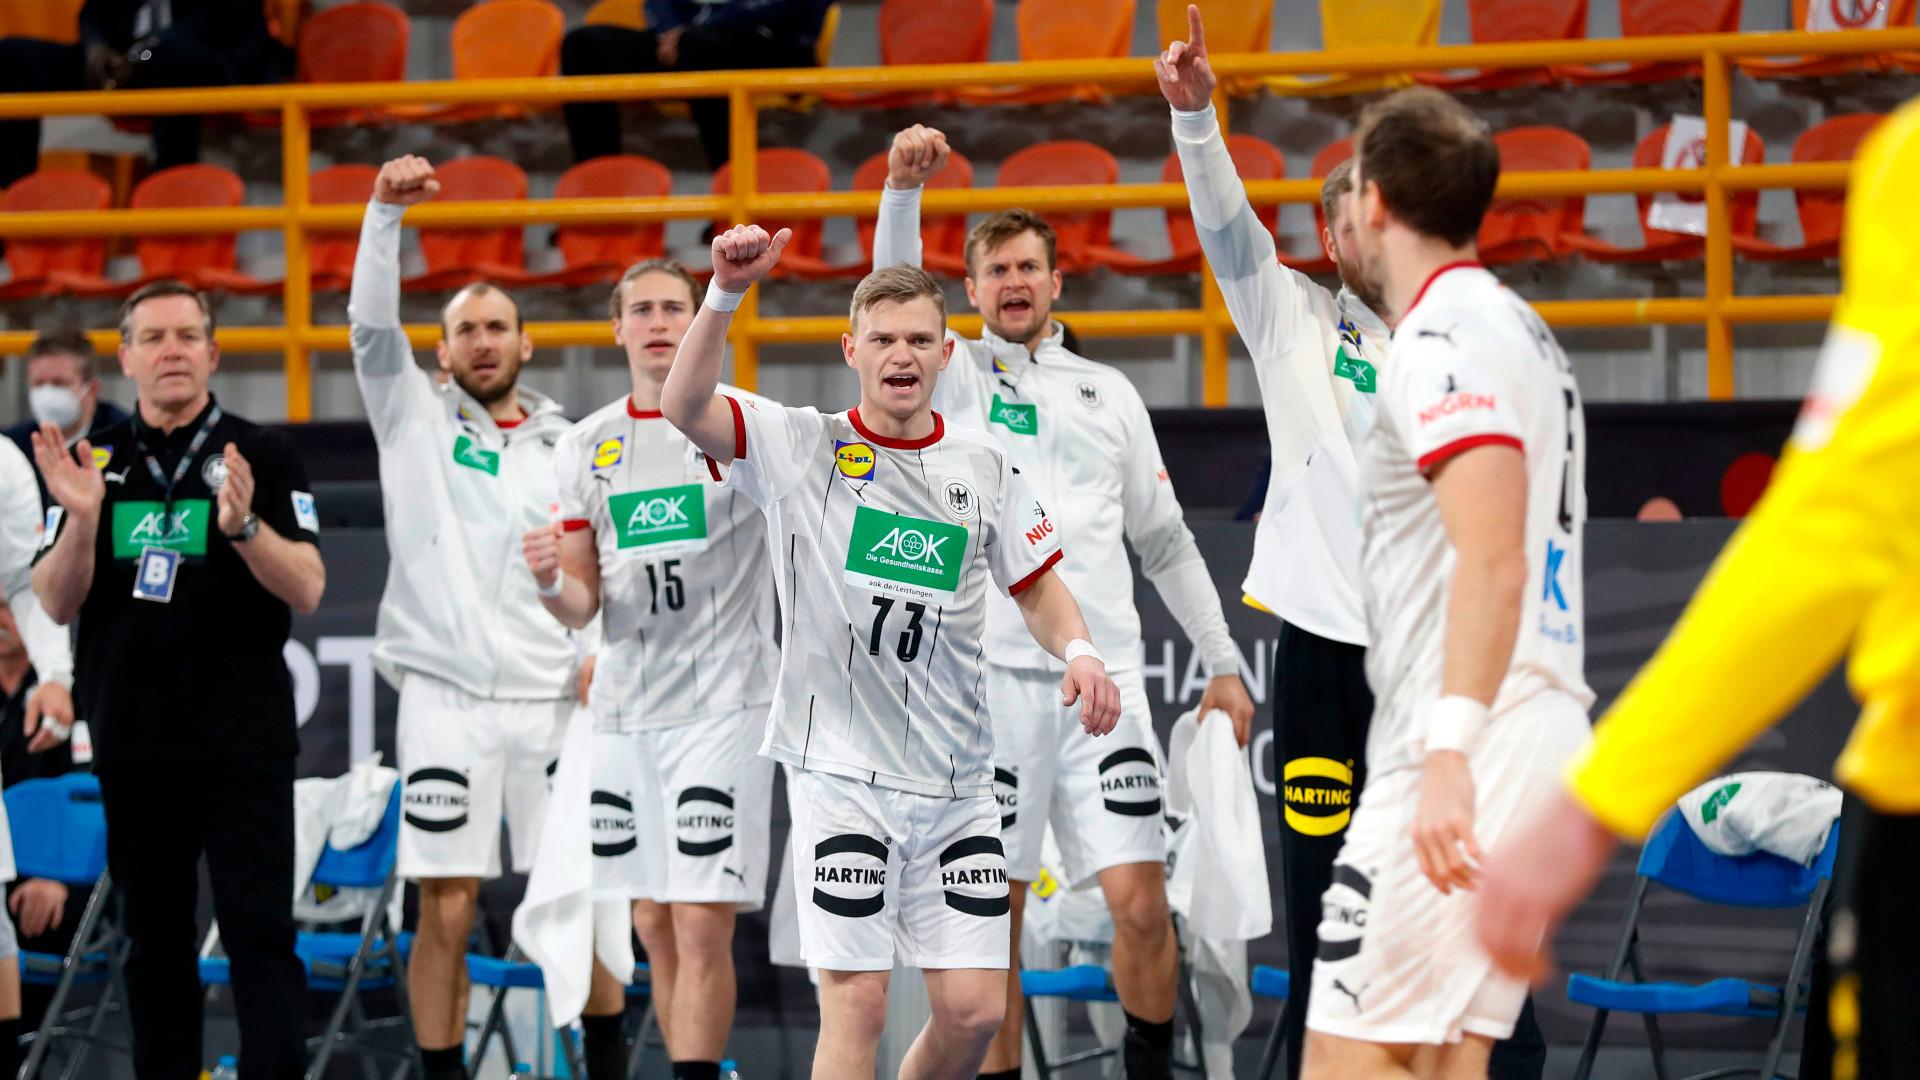 handball wm 2021 deutschland vs polen